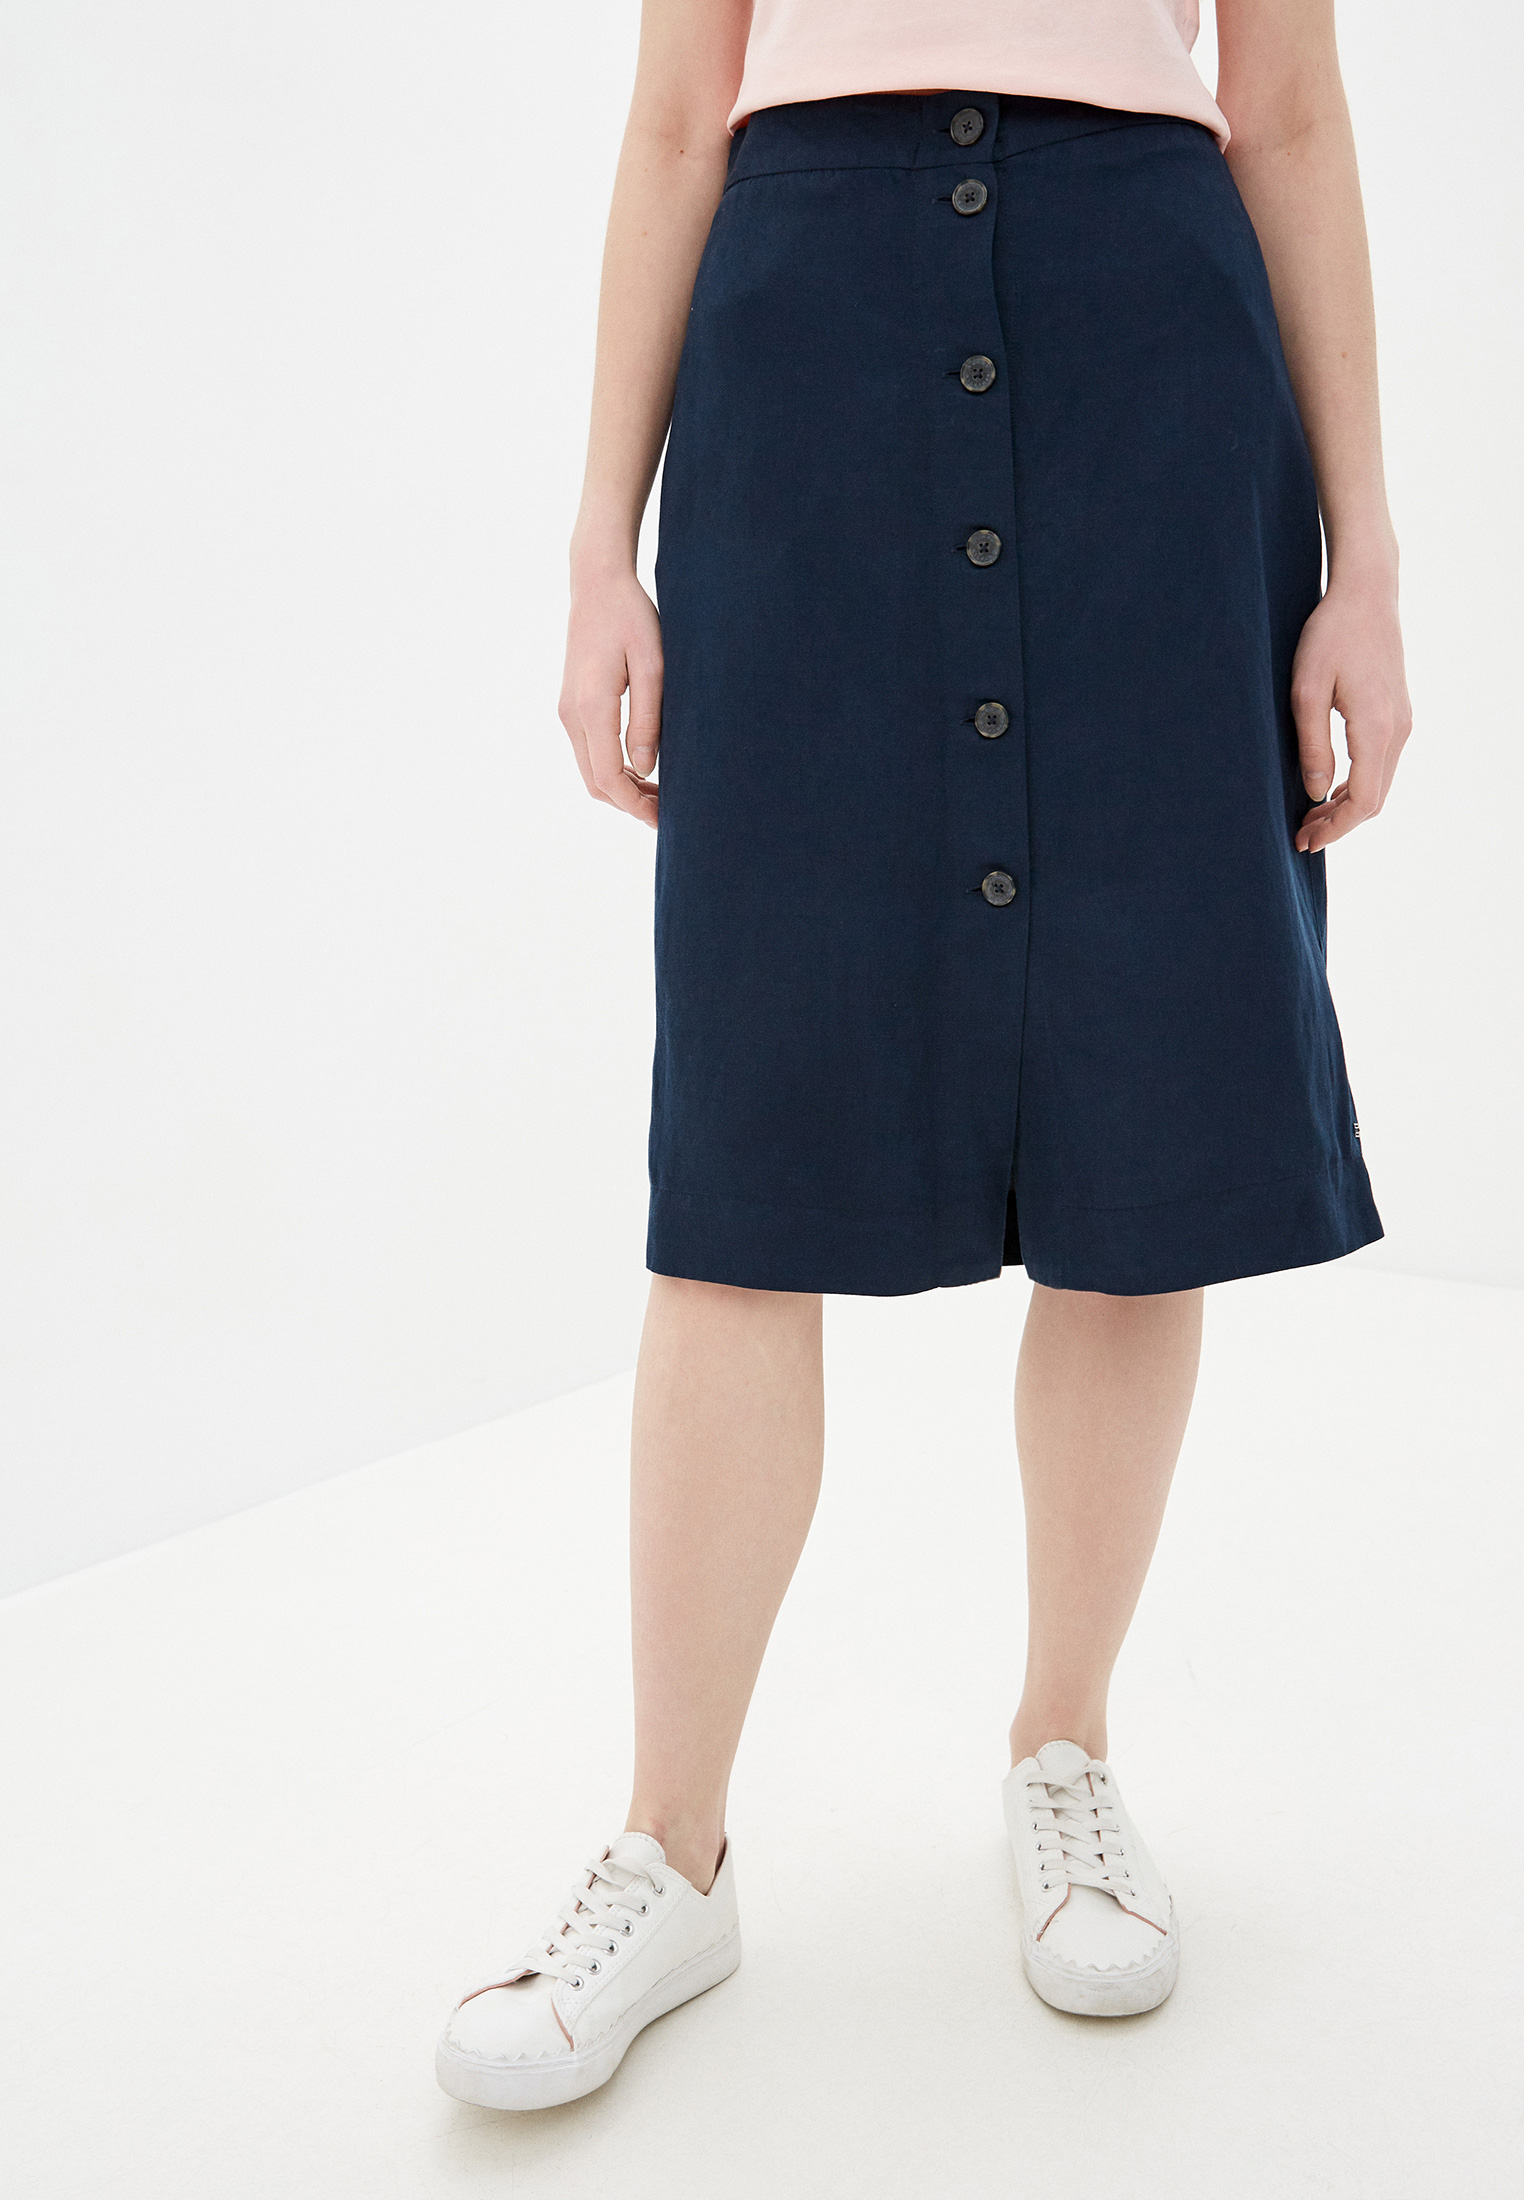 Широкая юбка Tommy Hilfiger (Томми Хилфигер) WW0WW28428